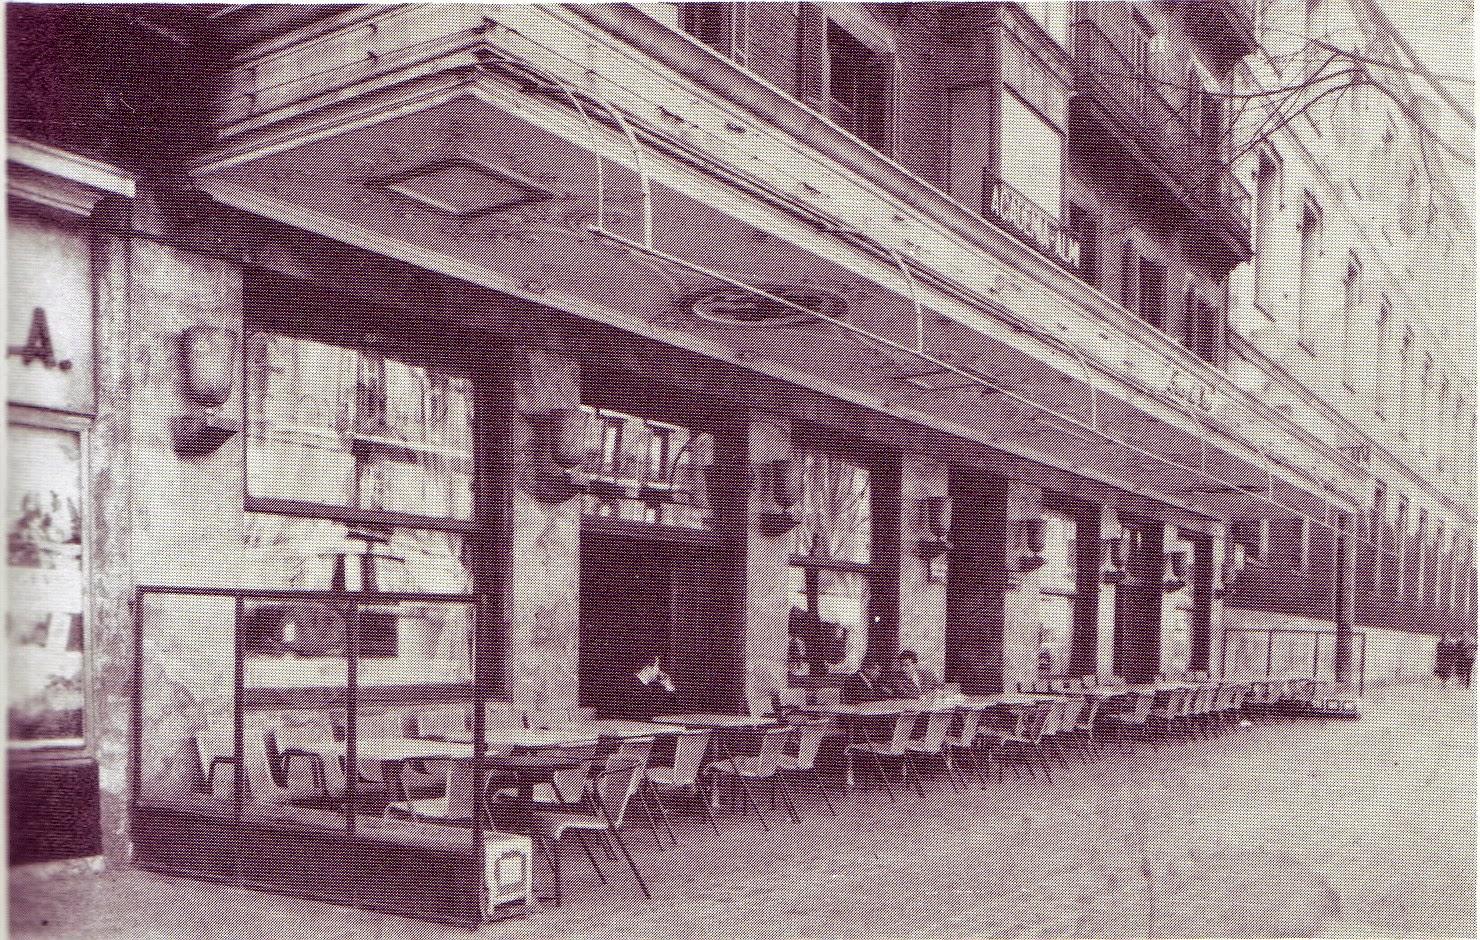 Blog de alberto rojo landaberea cafe lion d or bilbao - Bilbao fotos antiguas ...